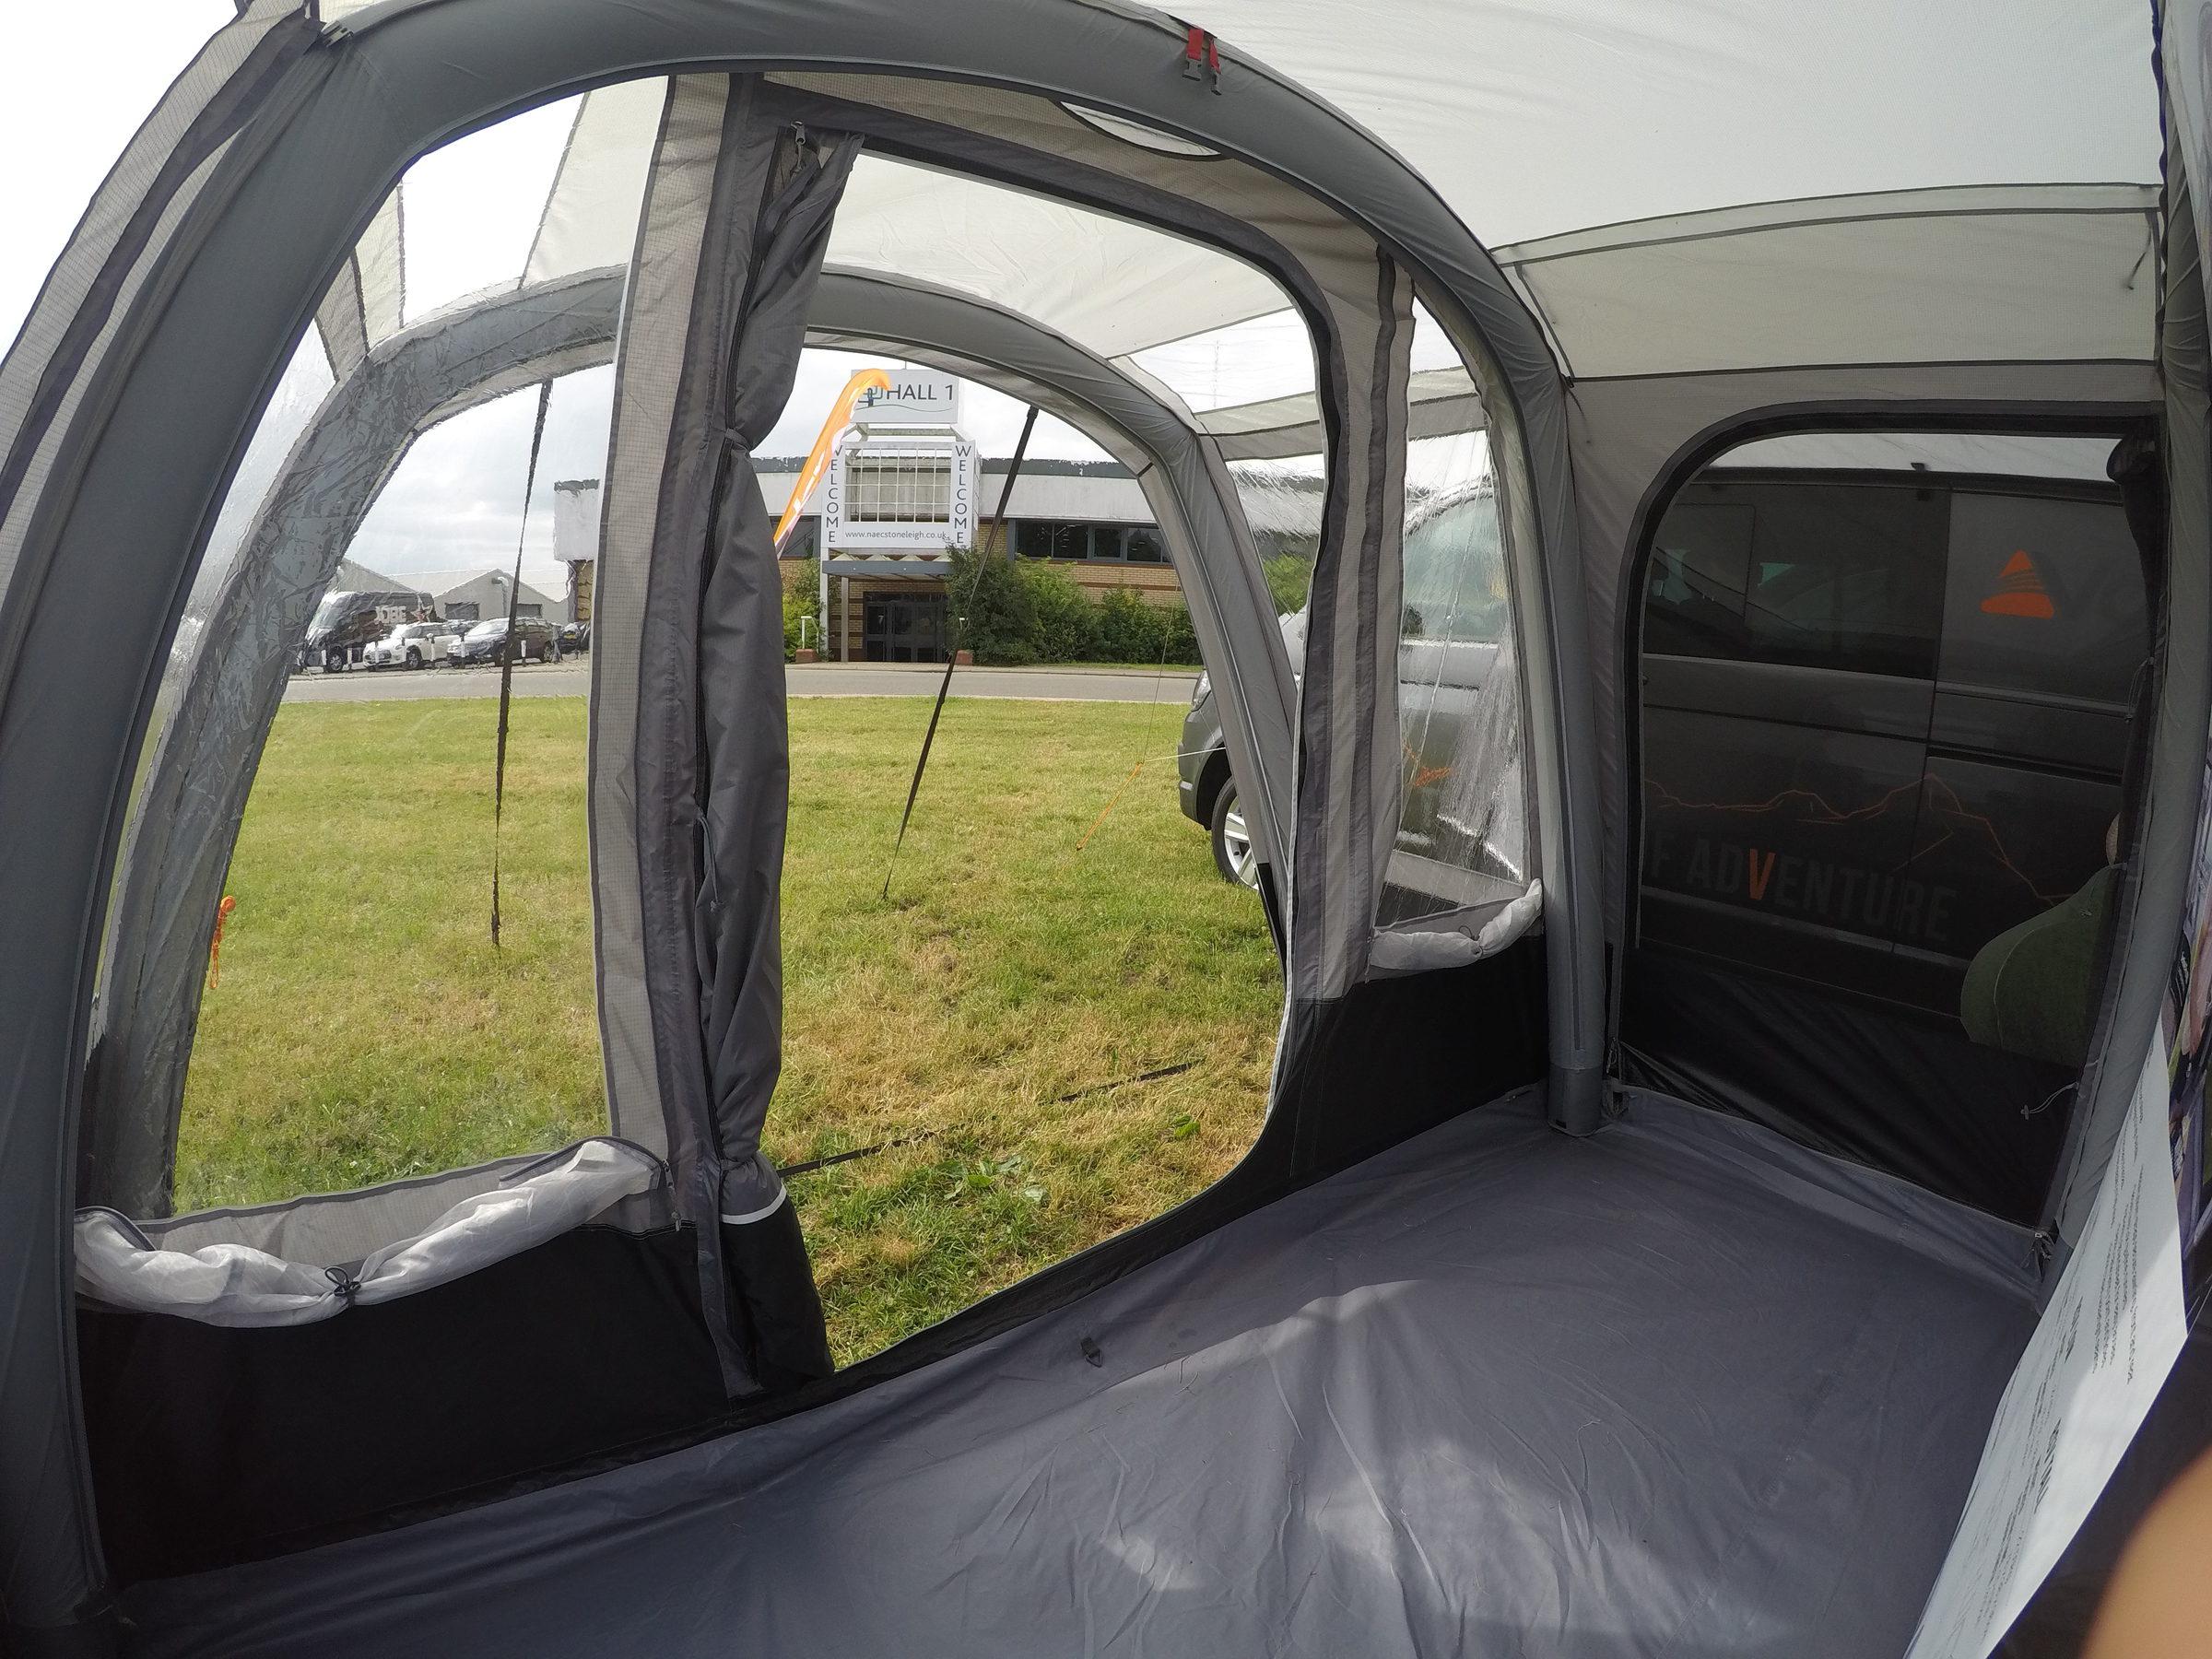 Vango Galli Compact Driveaway Awning 20189